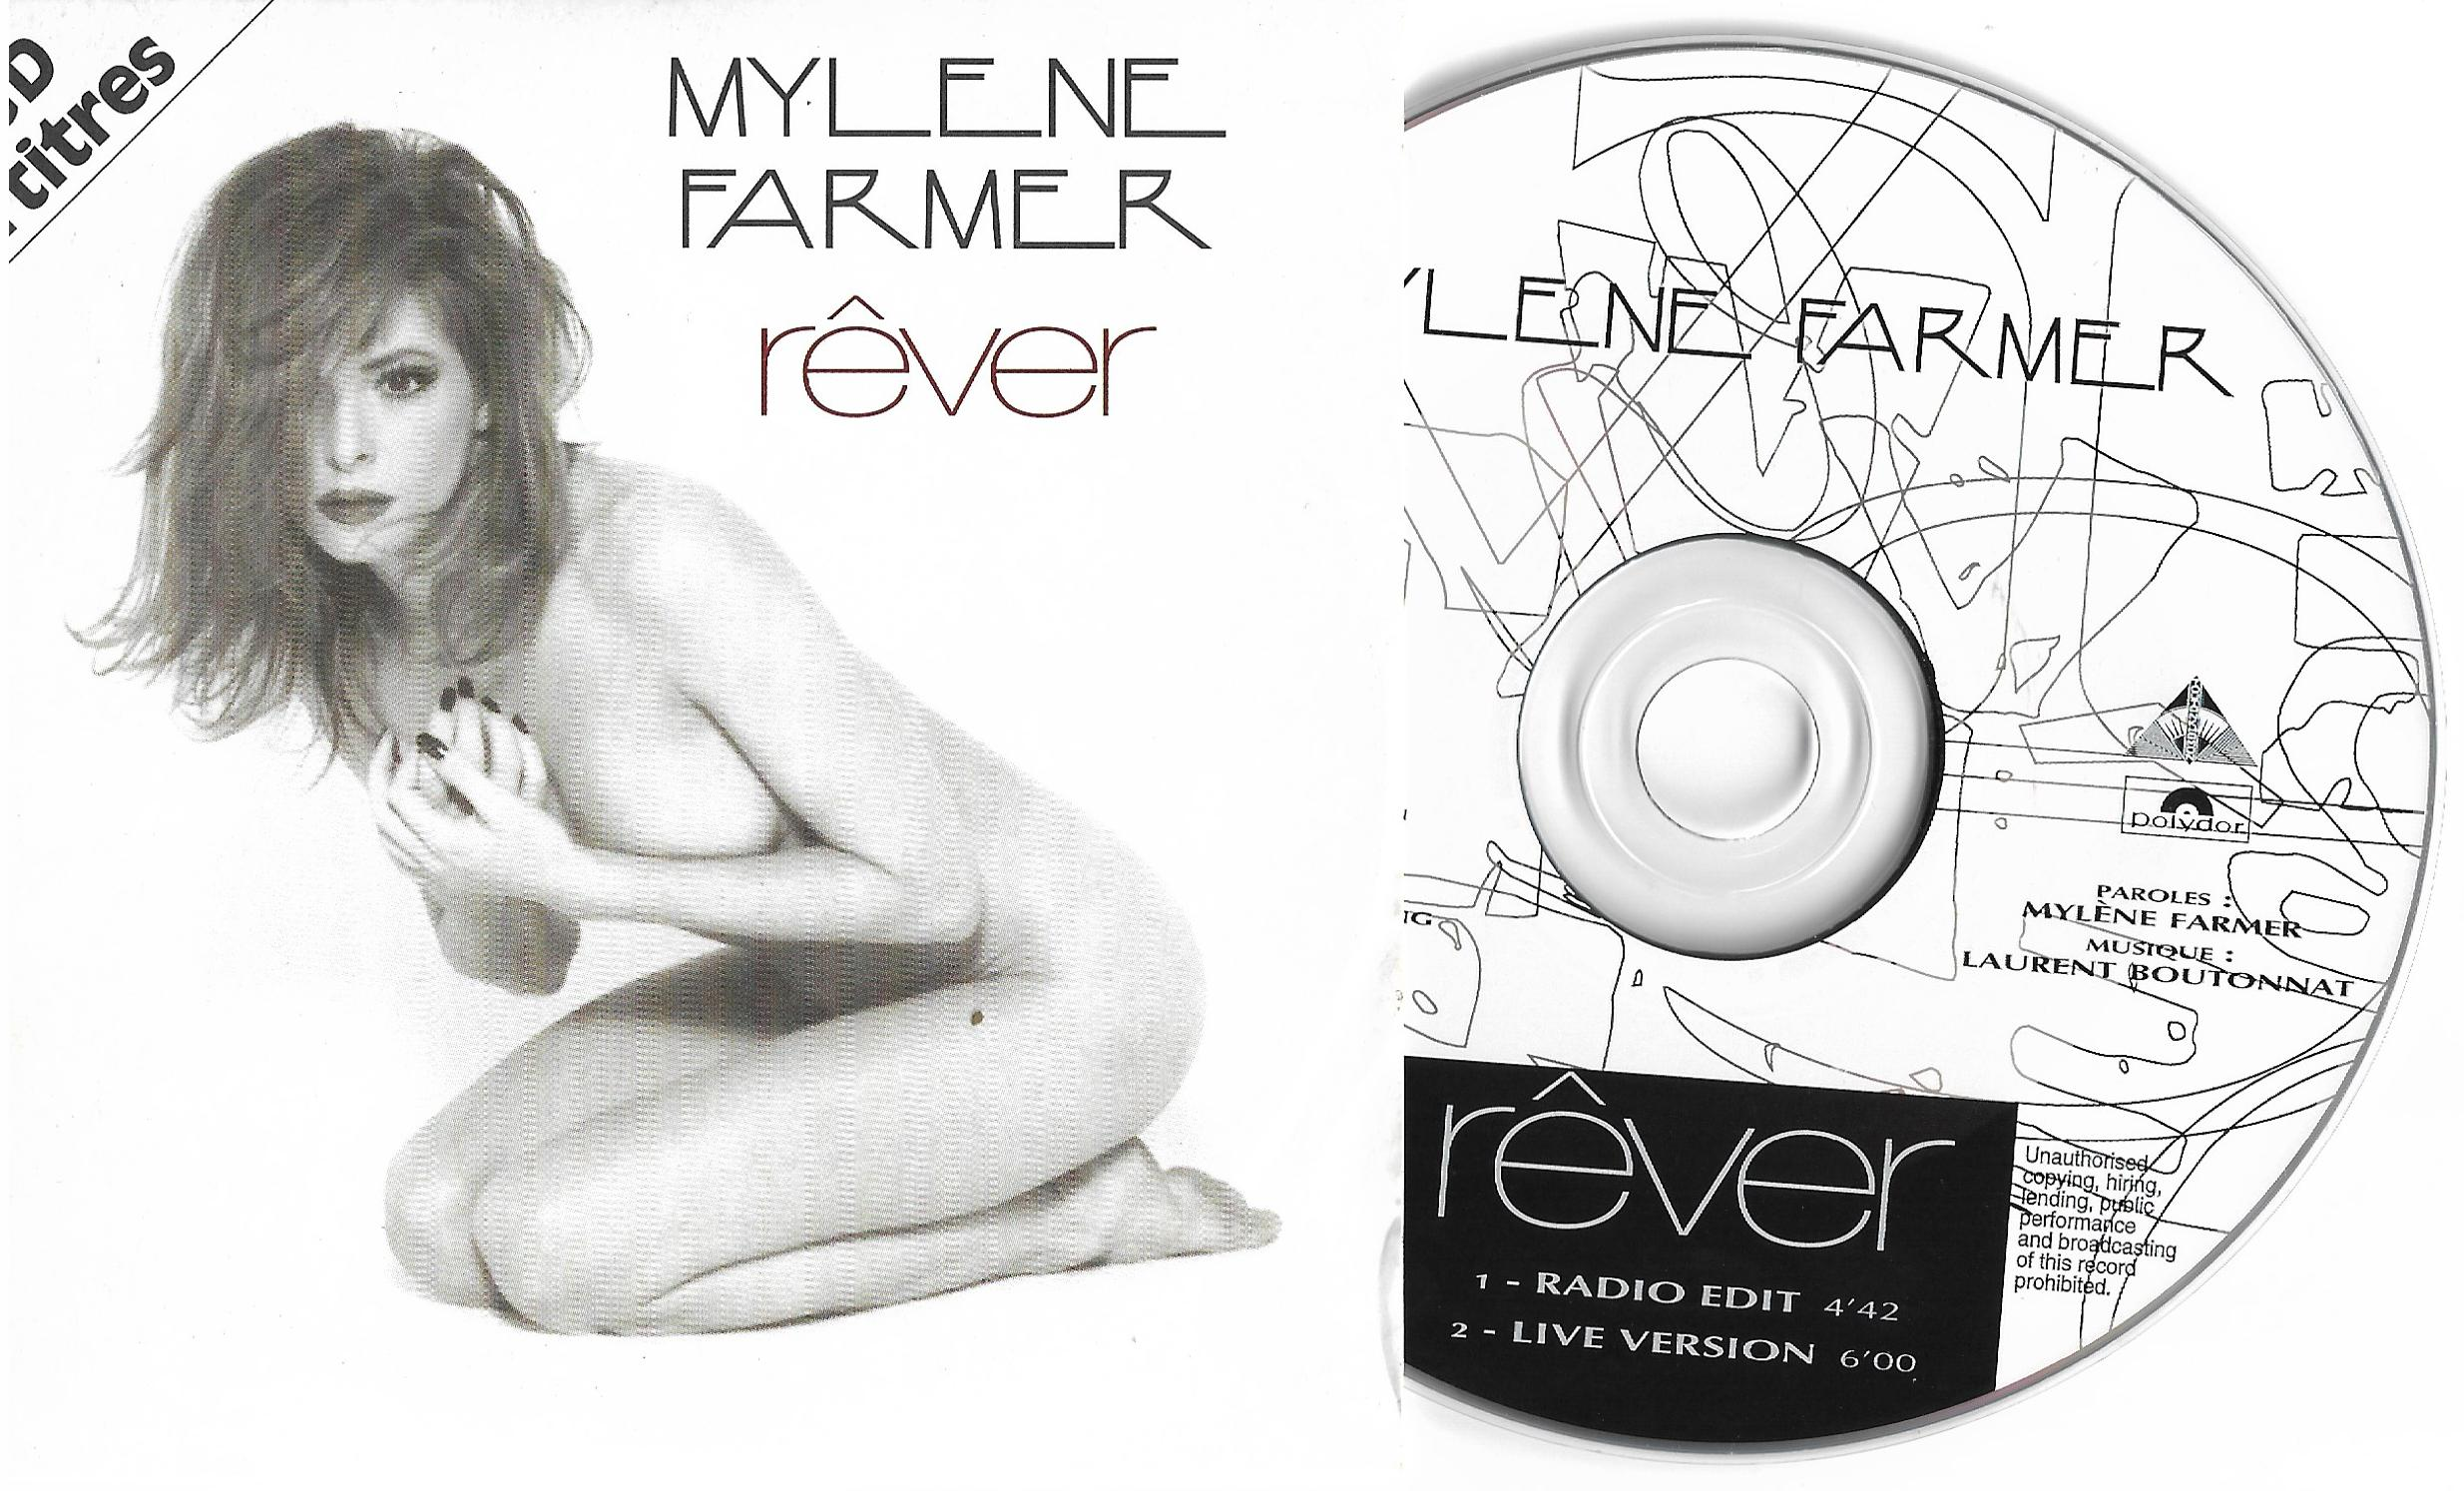 Rver 2